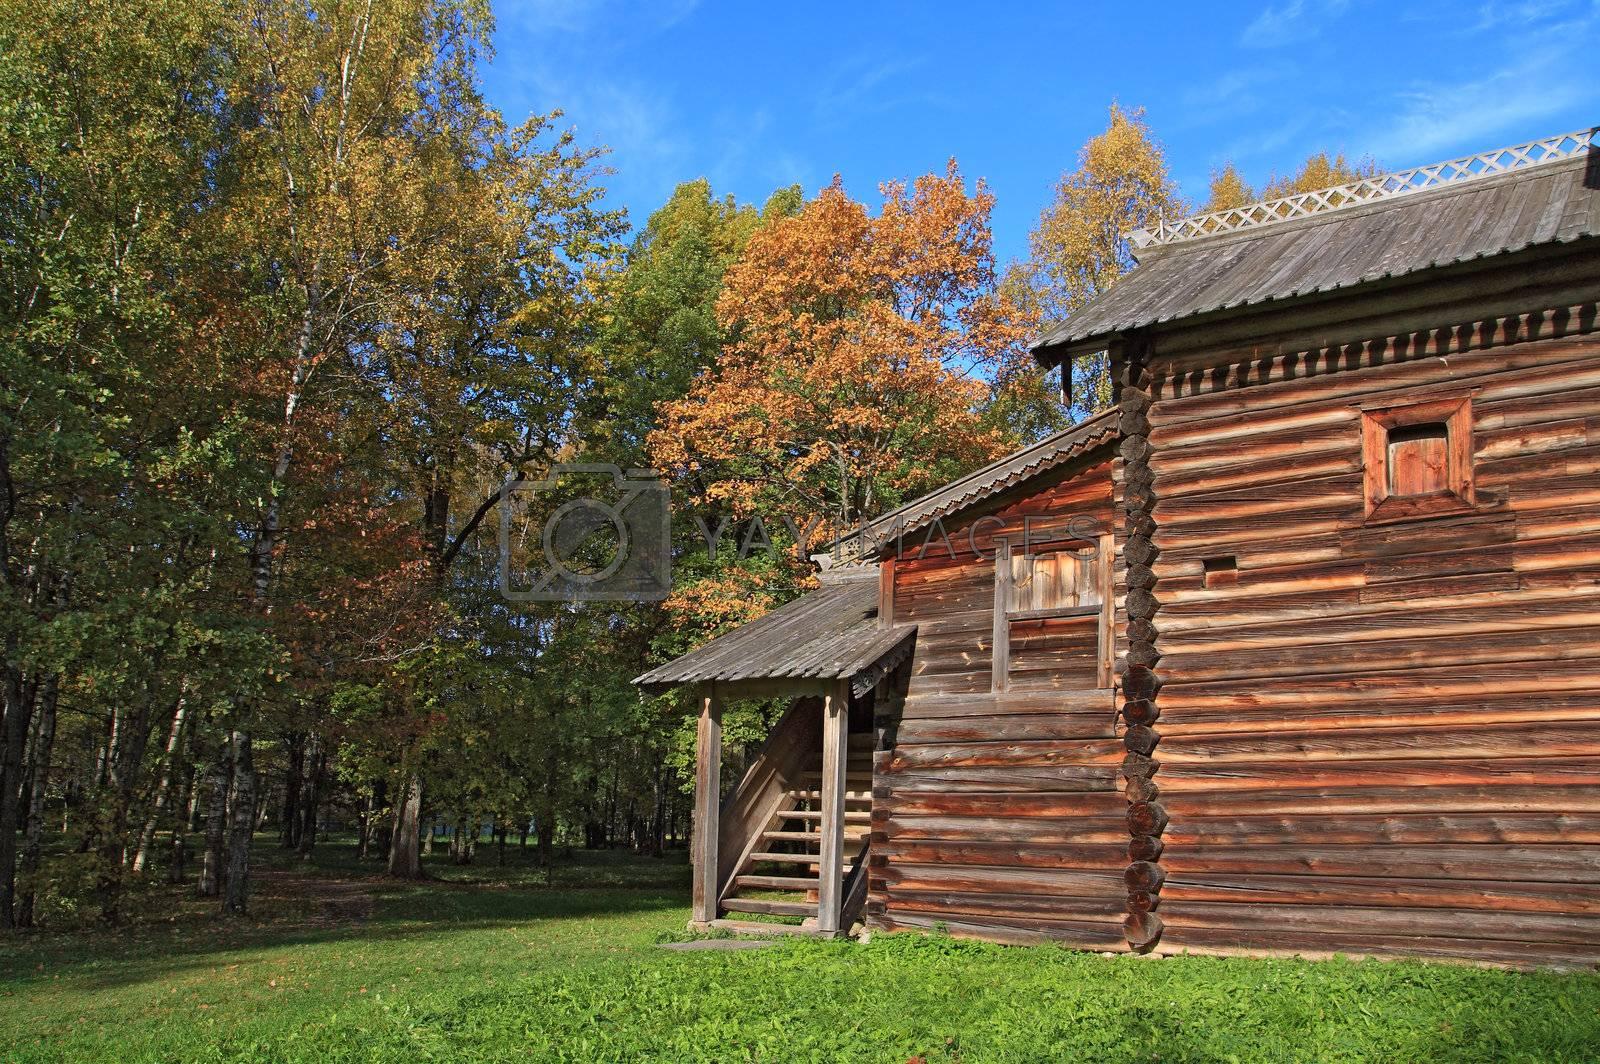 rural wooden house amongst autumn wood